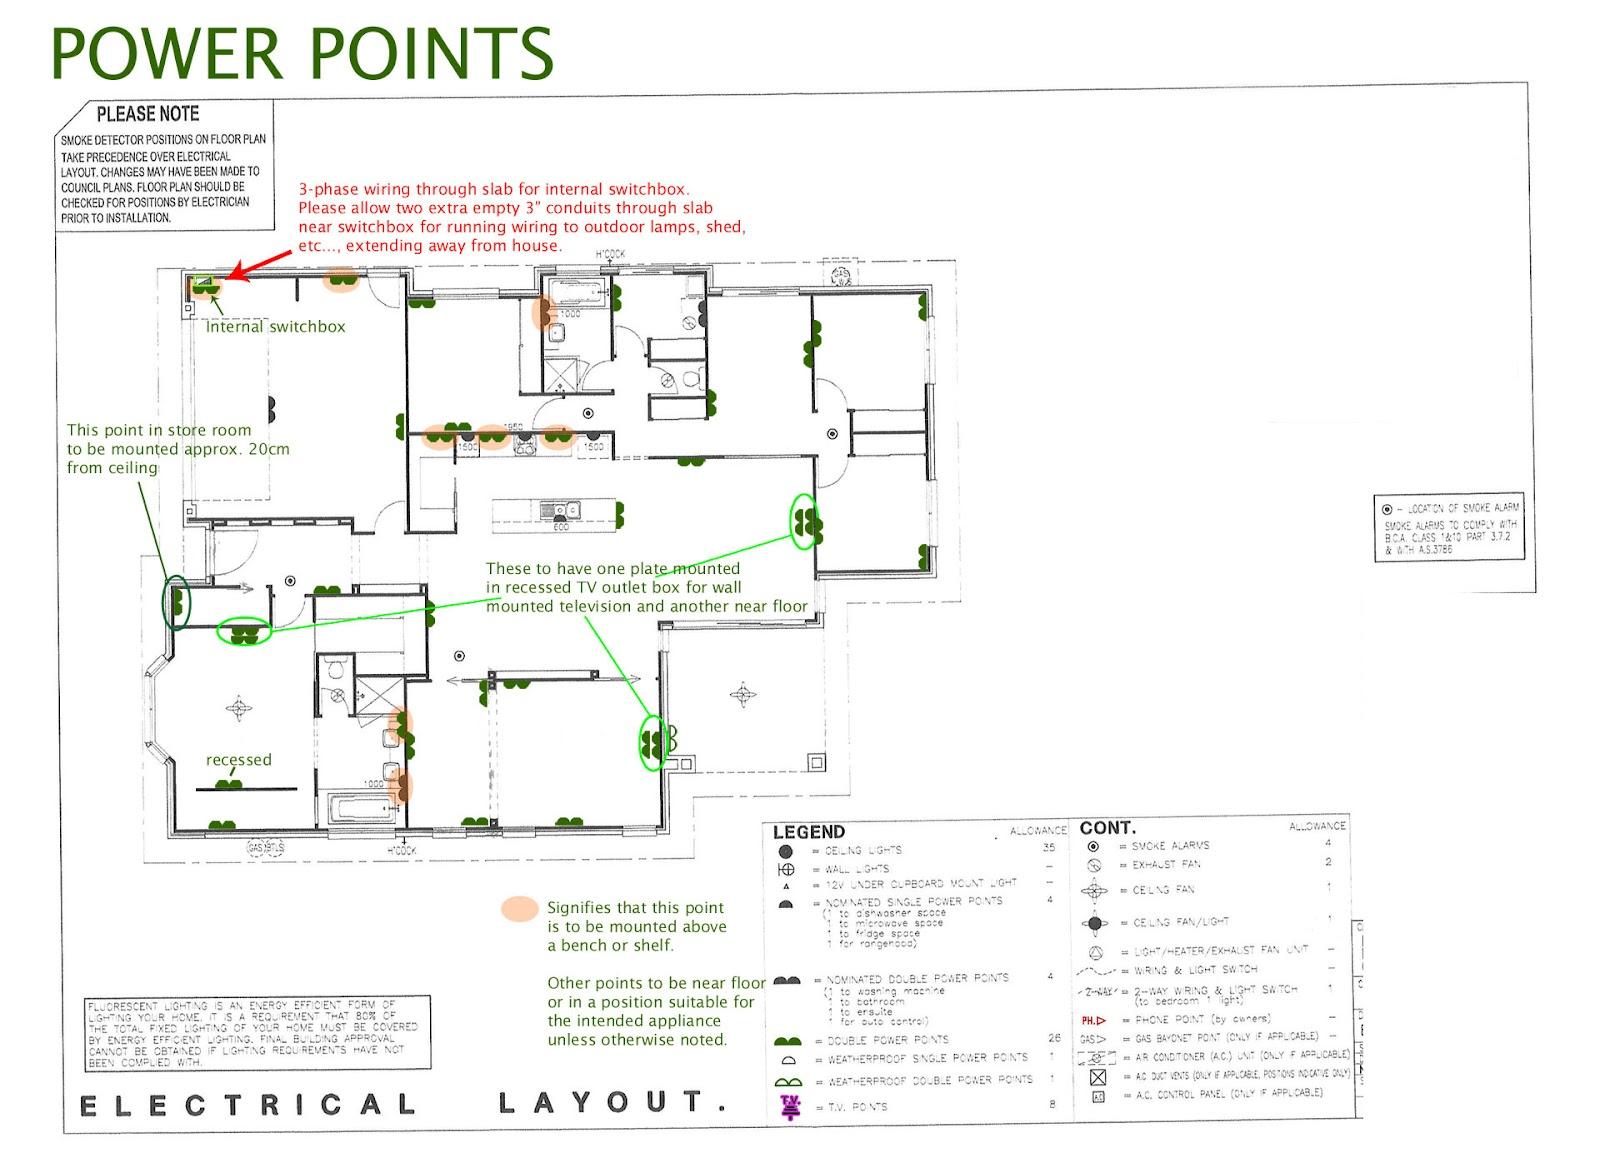 VF_5419] Three Phase Electrical Wiring Installation At Home Schematic WiringOmit Lotap Mohammedshrine Librar Wiring 101